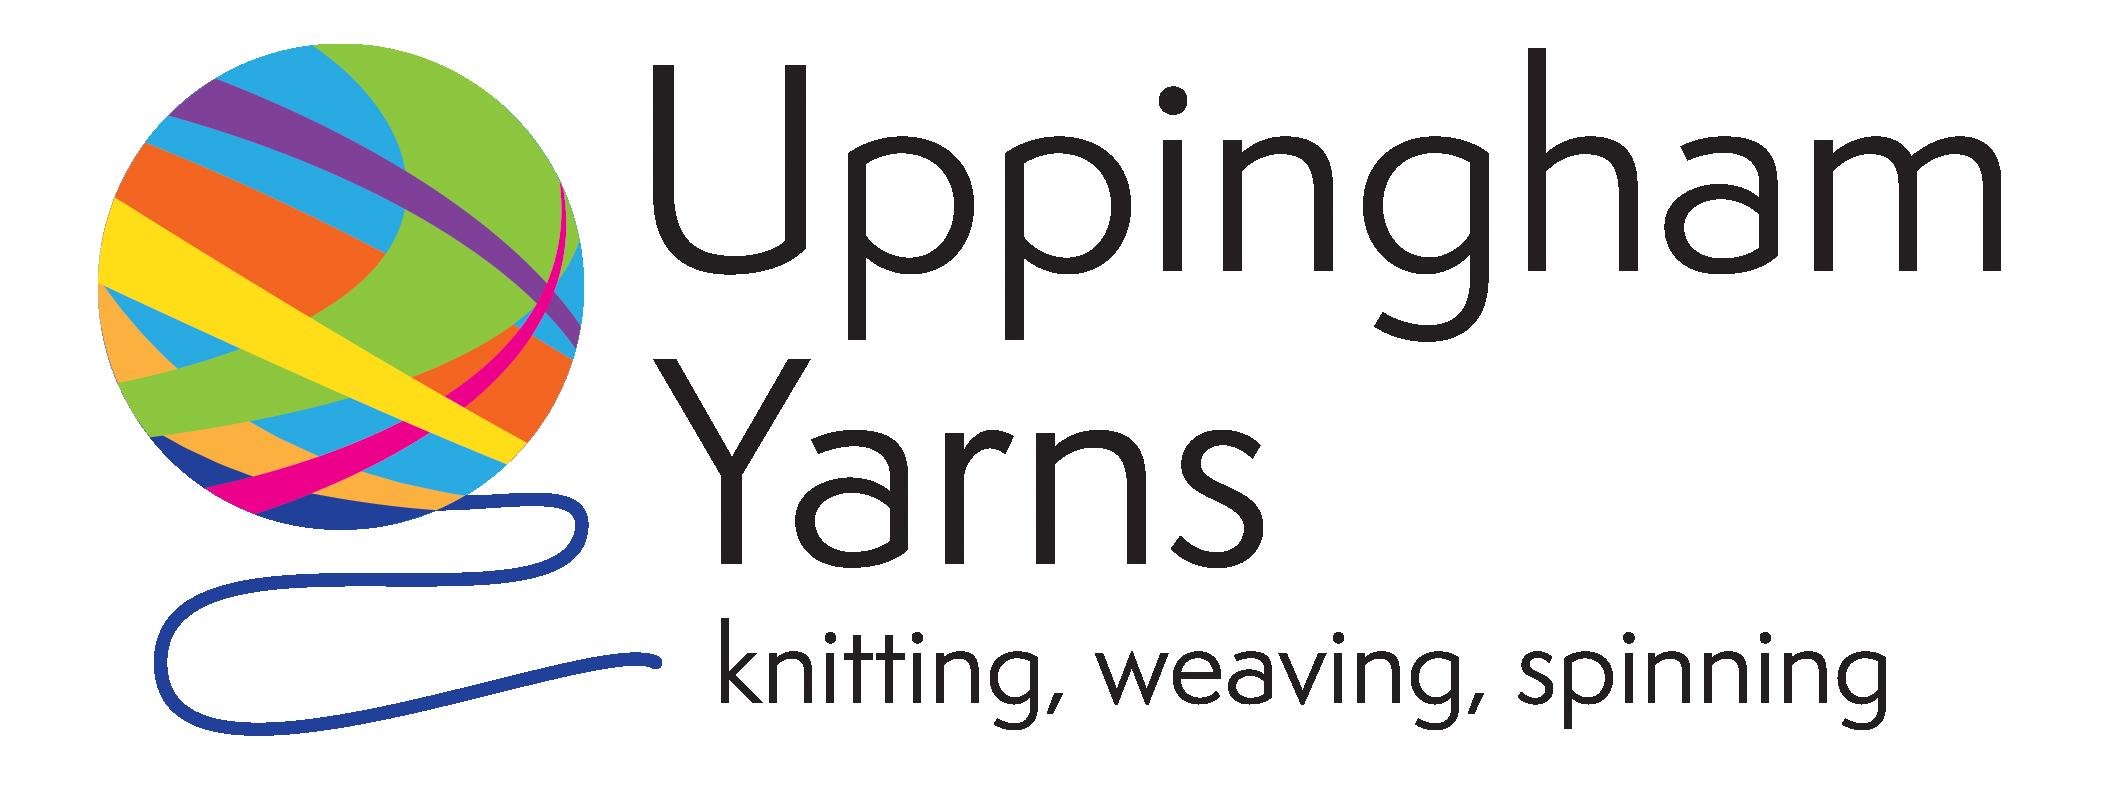 Uppingham Yarns